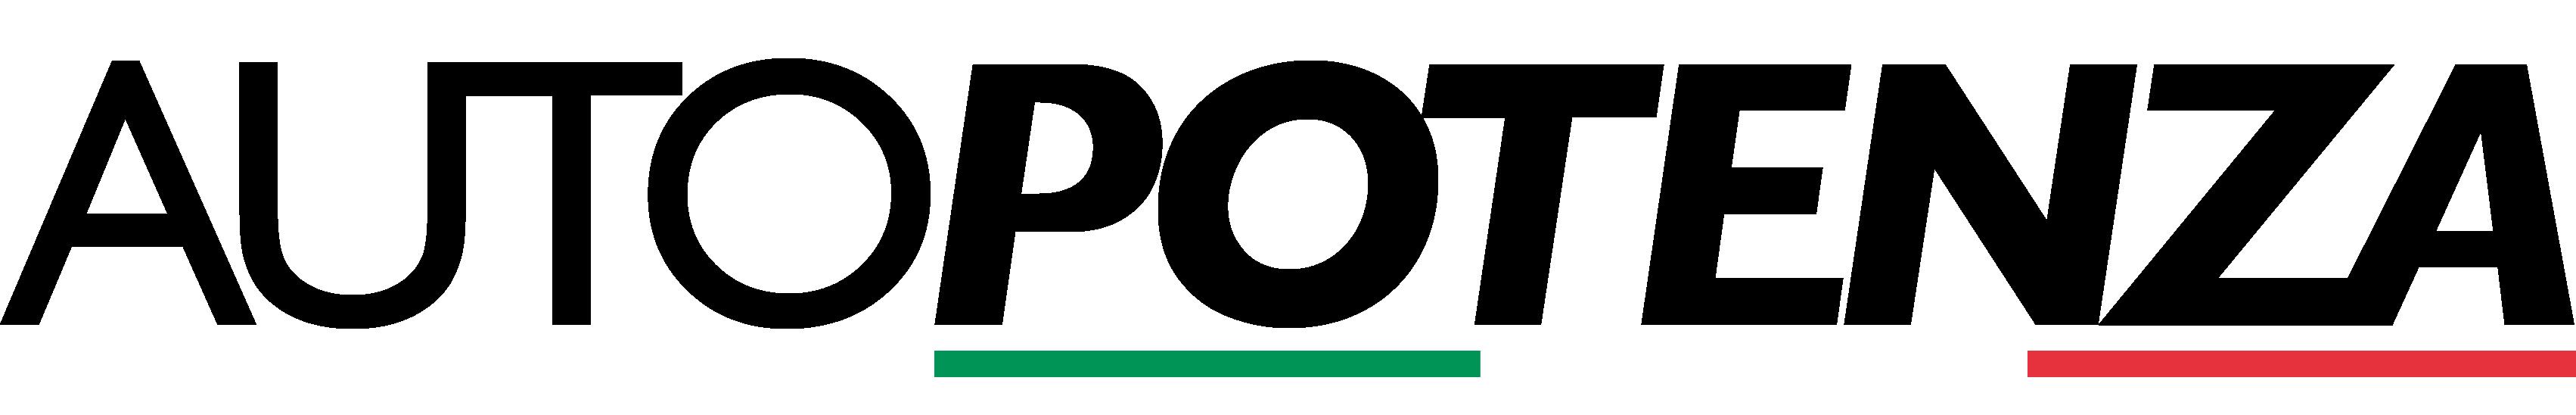 Logo - Autopotenza.nl